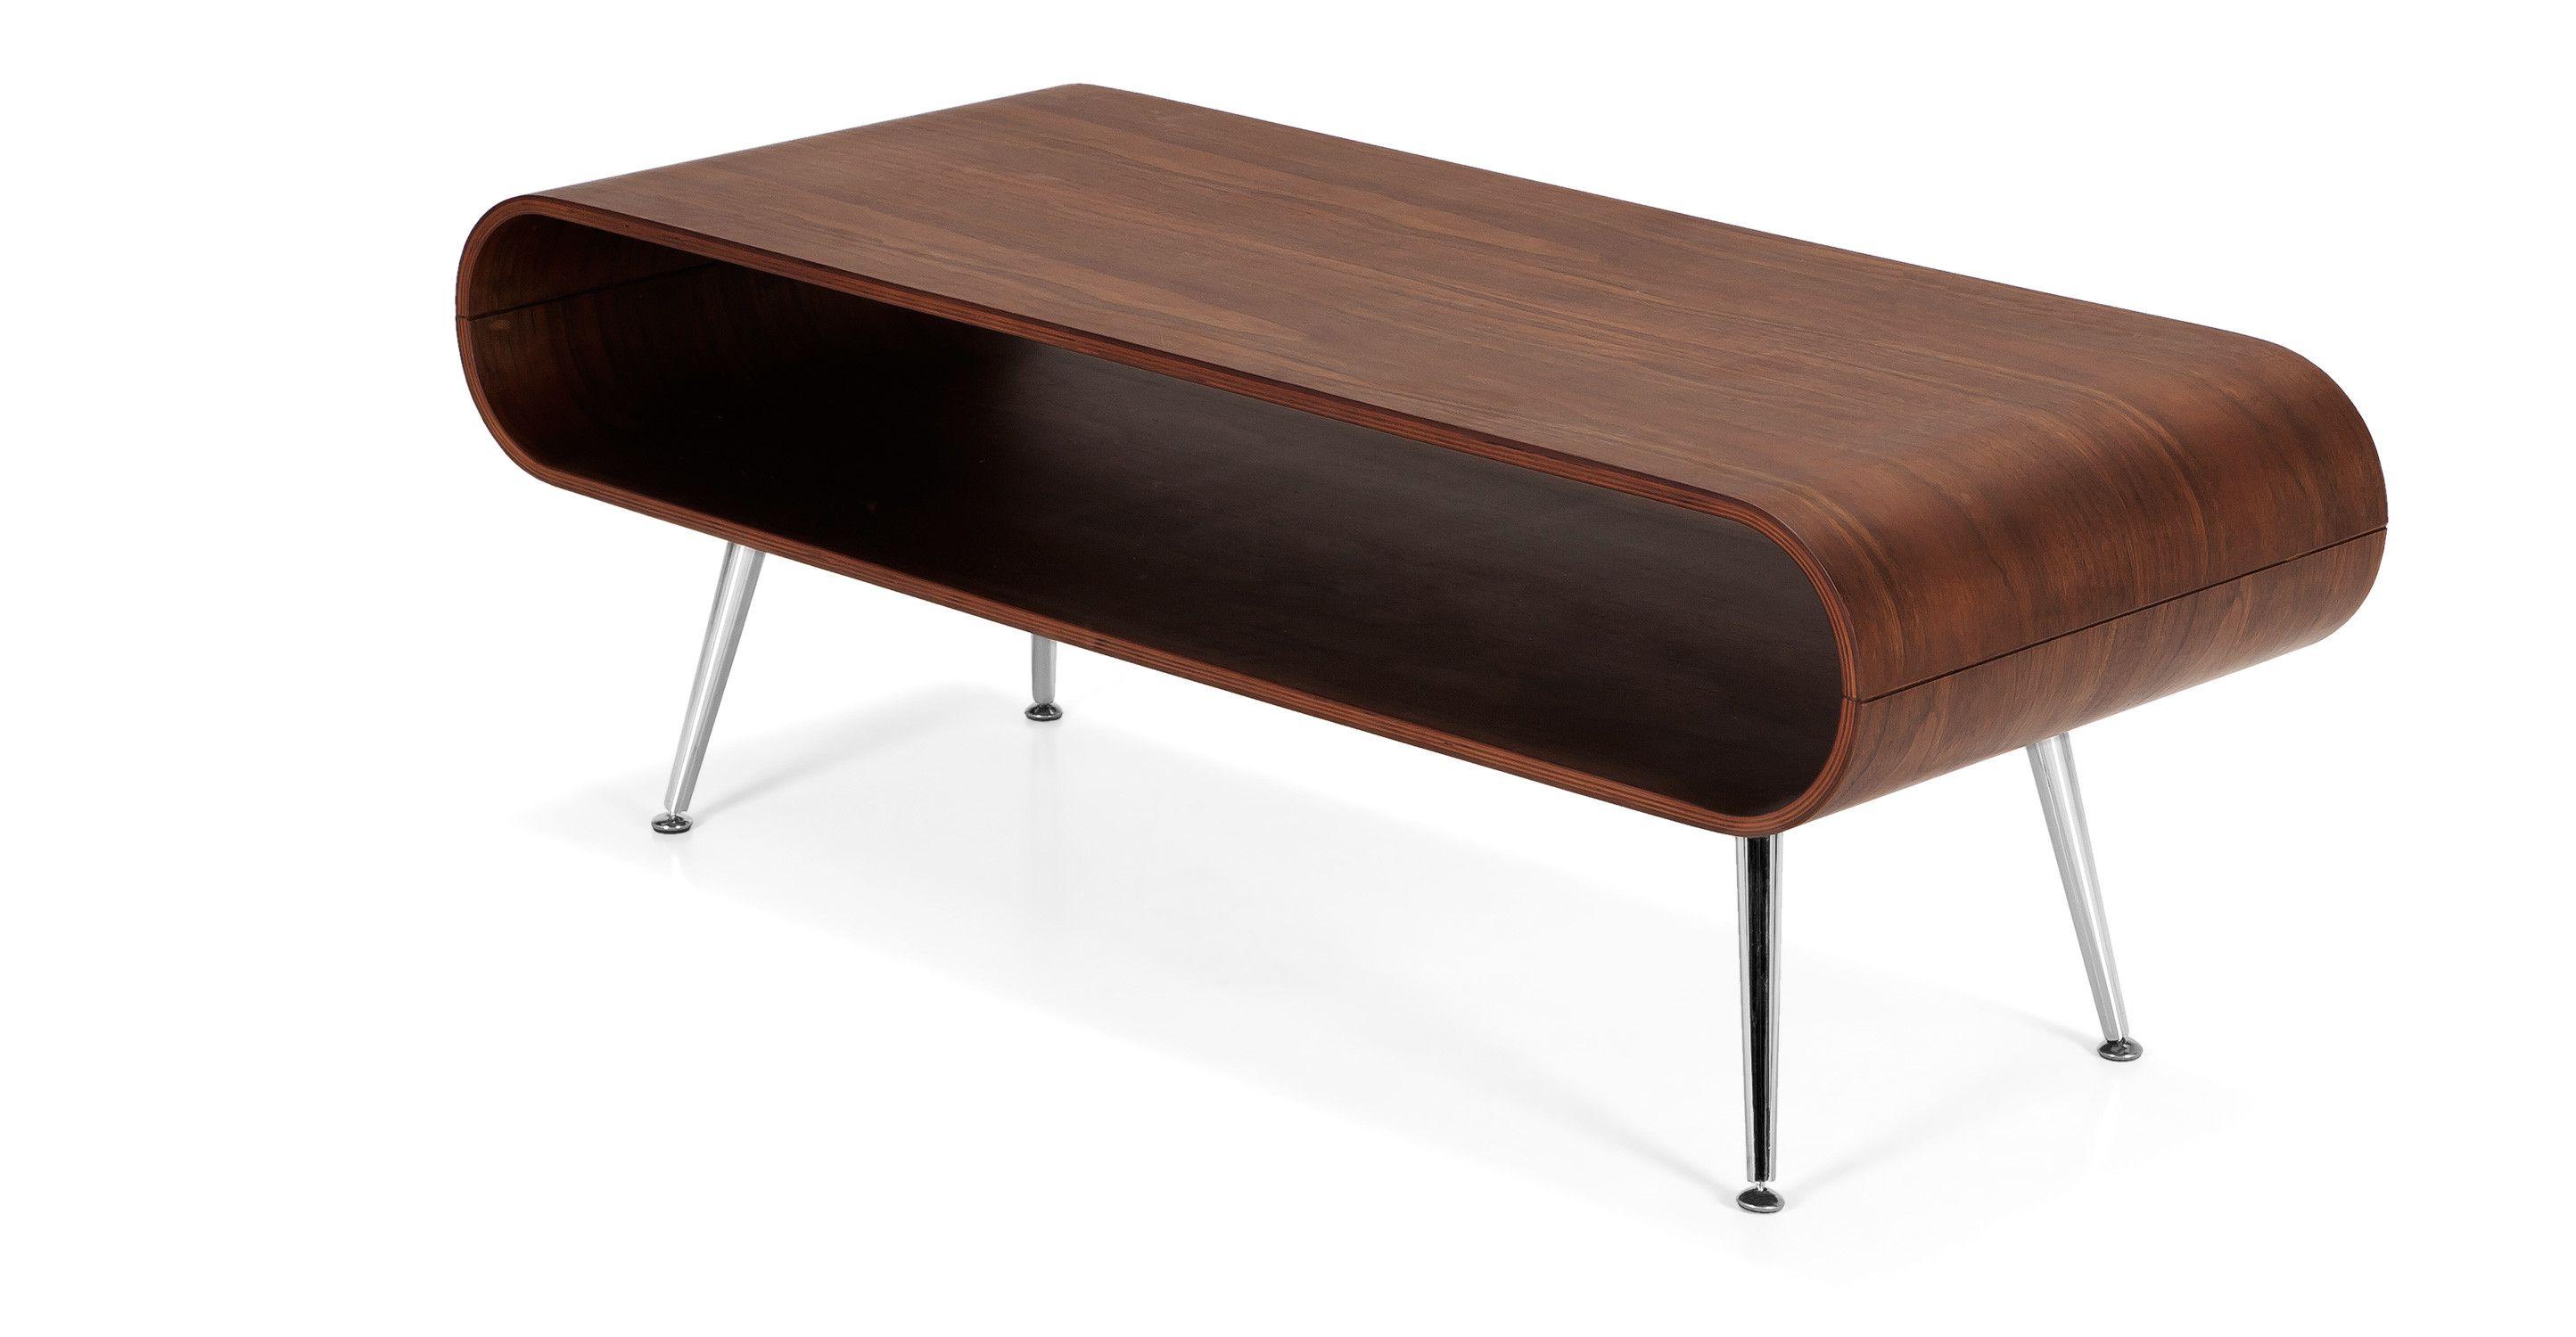 594b6018ba7b1f0b09864e9a2da0fcc5 Incroyable De Table Basse Ajustable Schème